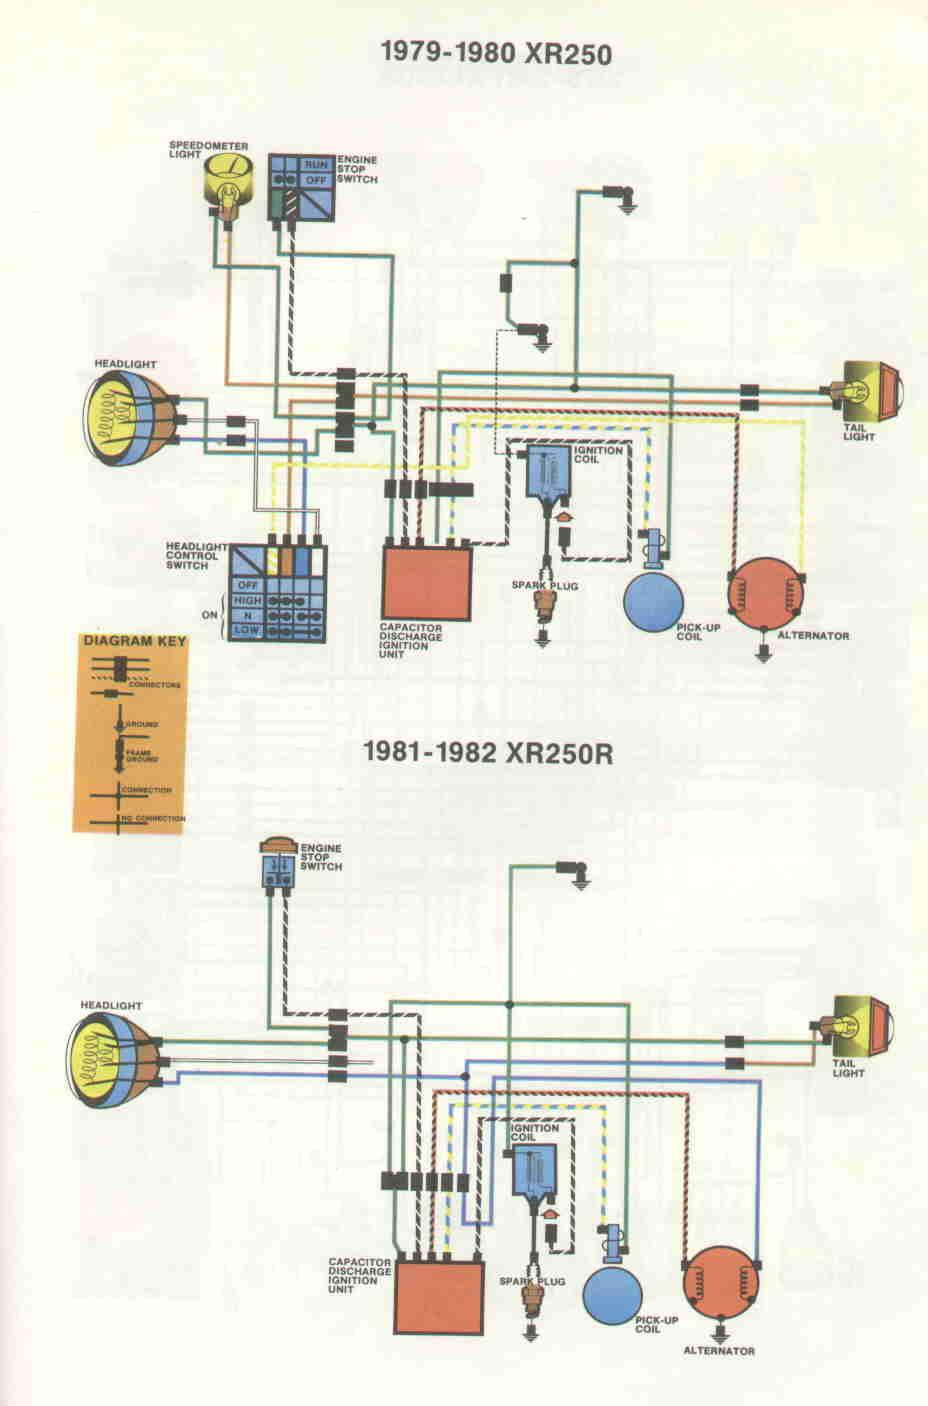 Superb Wiring Diagram Besides Honda Xl600R Wiring Diagram On Xr250R 1984 Wiring Cloud Histehirlexornumapkesianilluminateatxorg